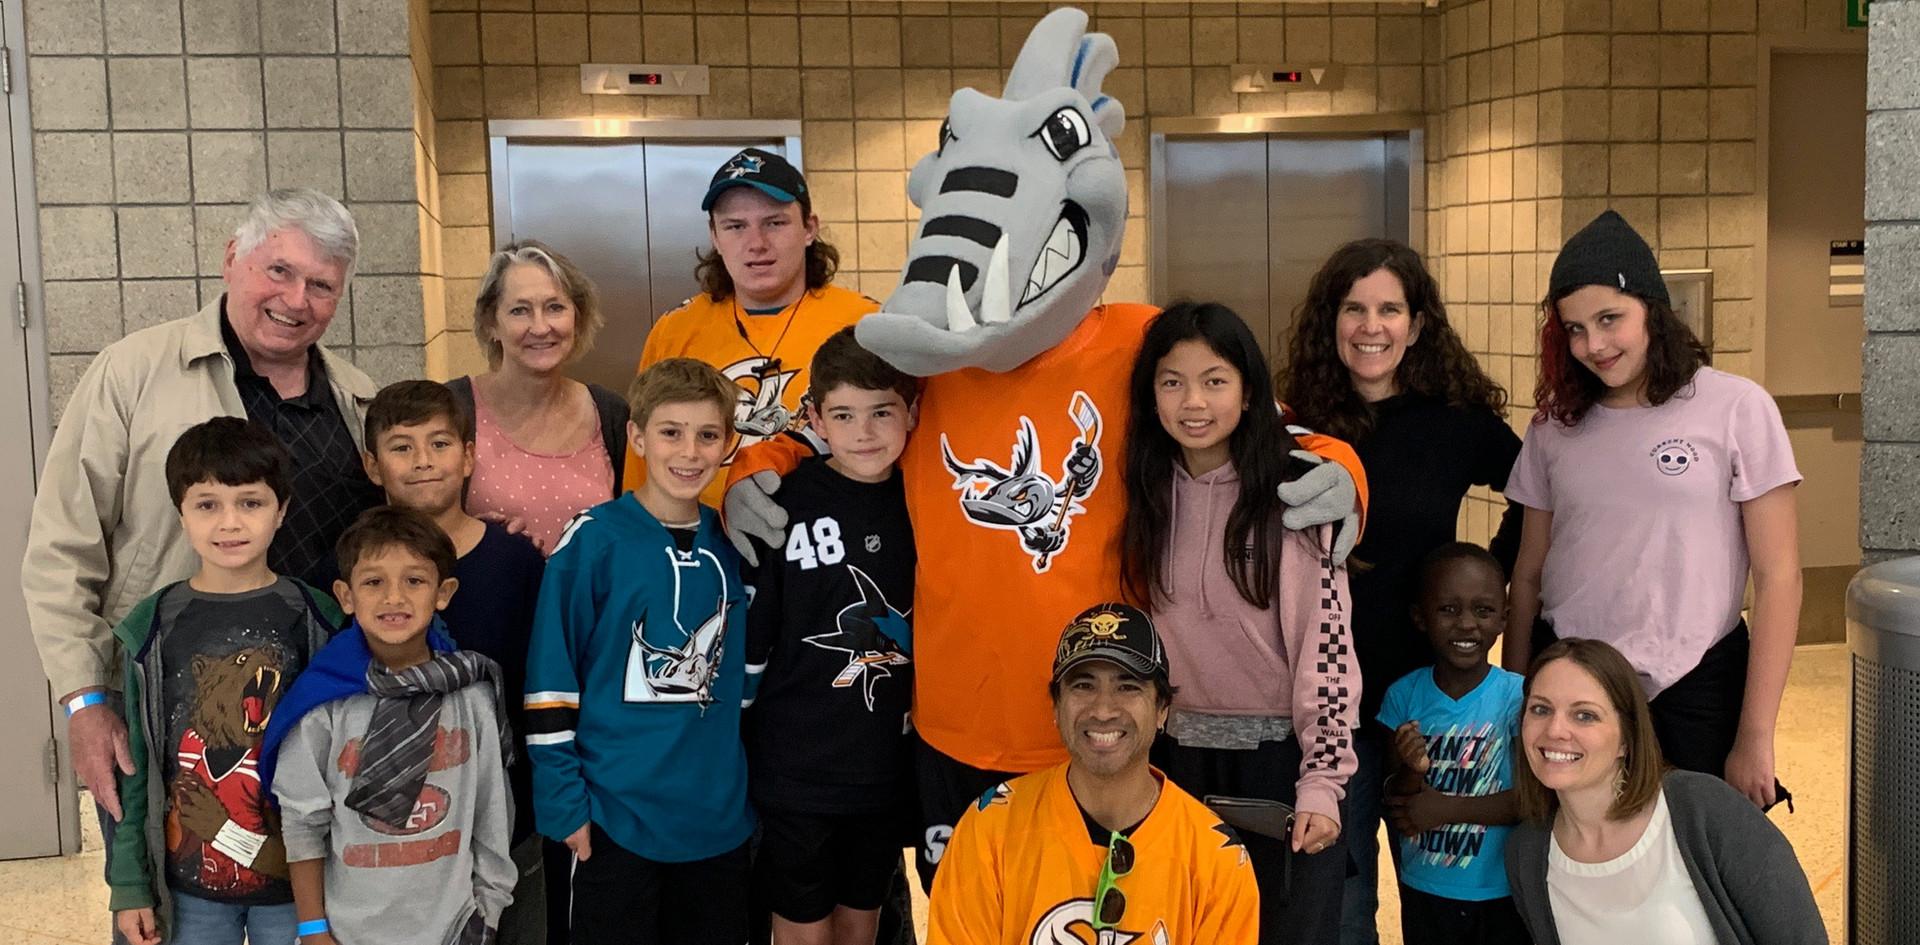 Adoption Awareness Day at SJ Barracudas Hockey